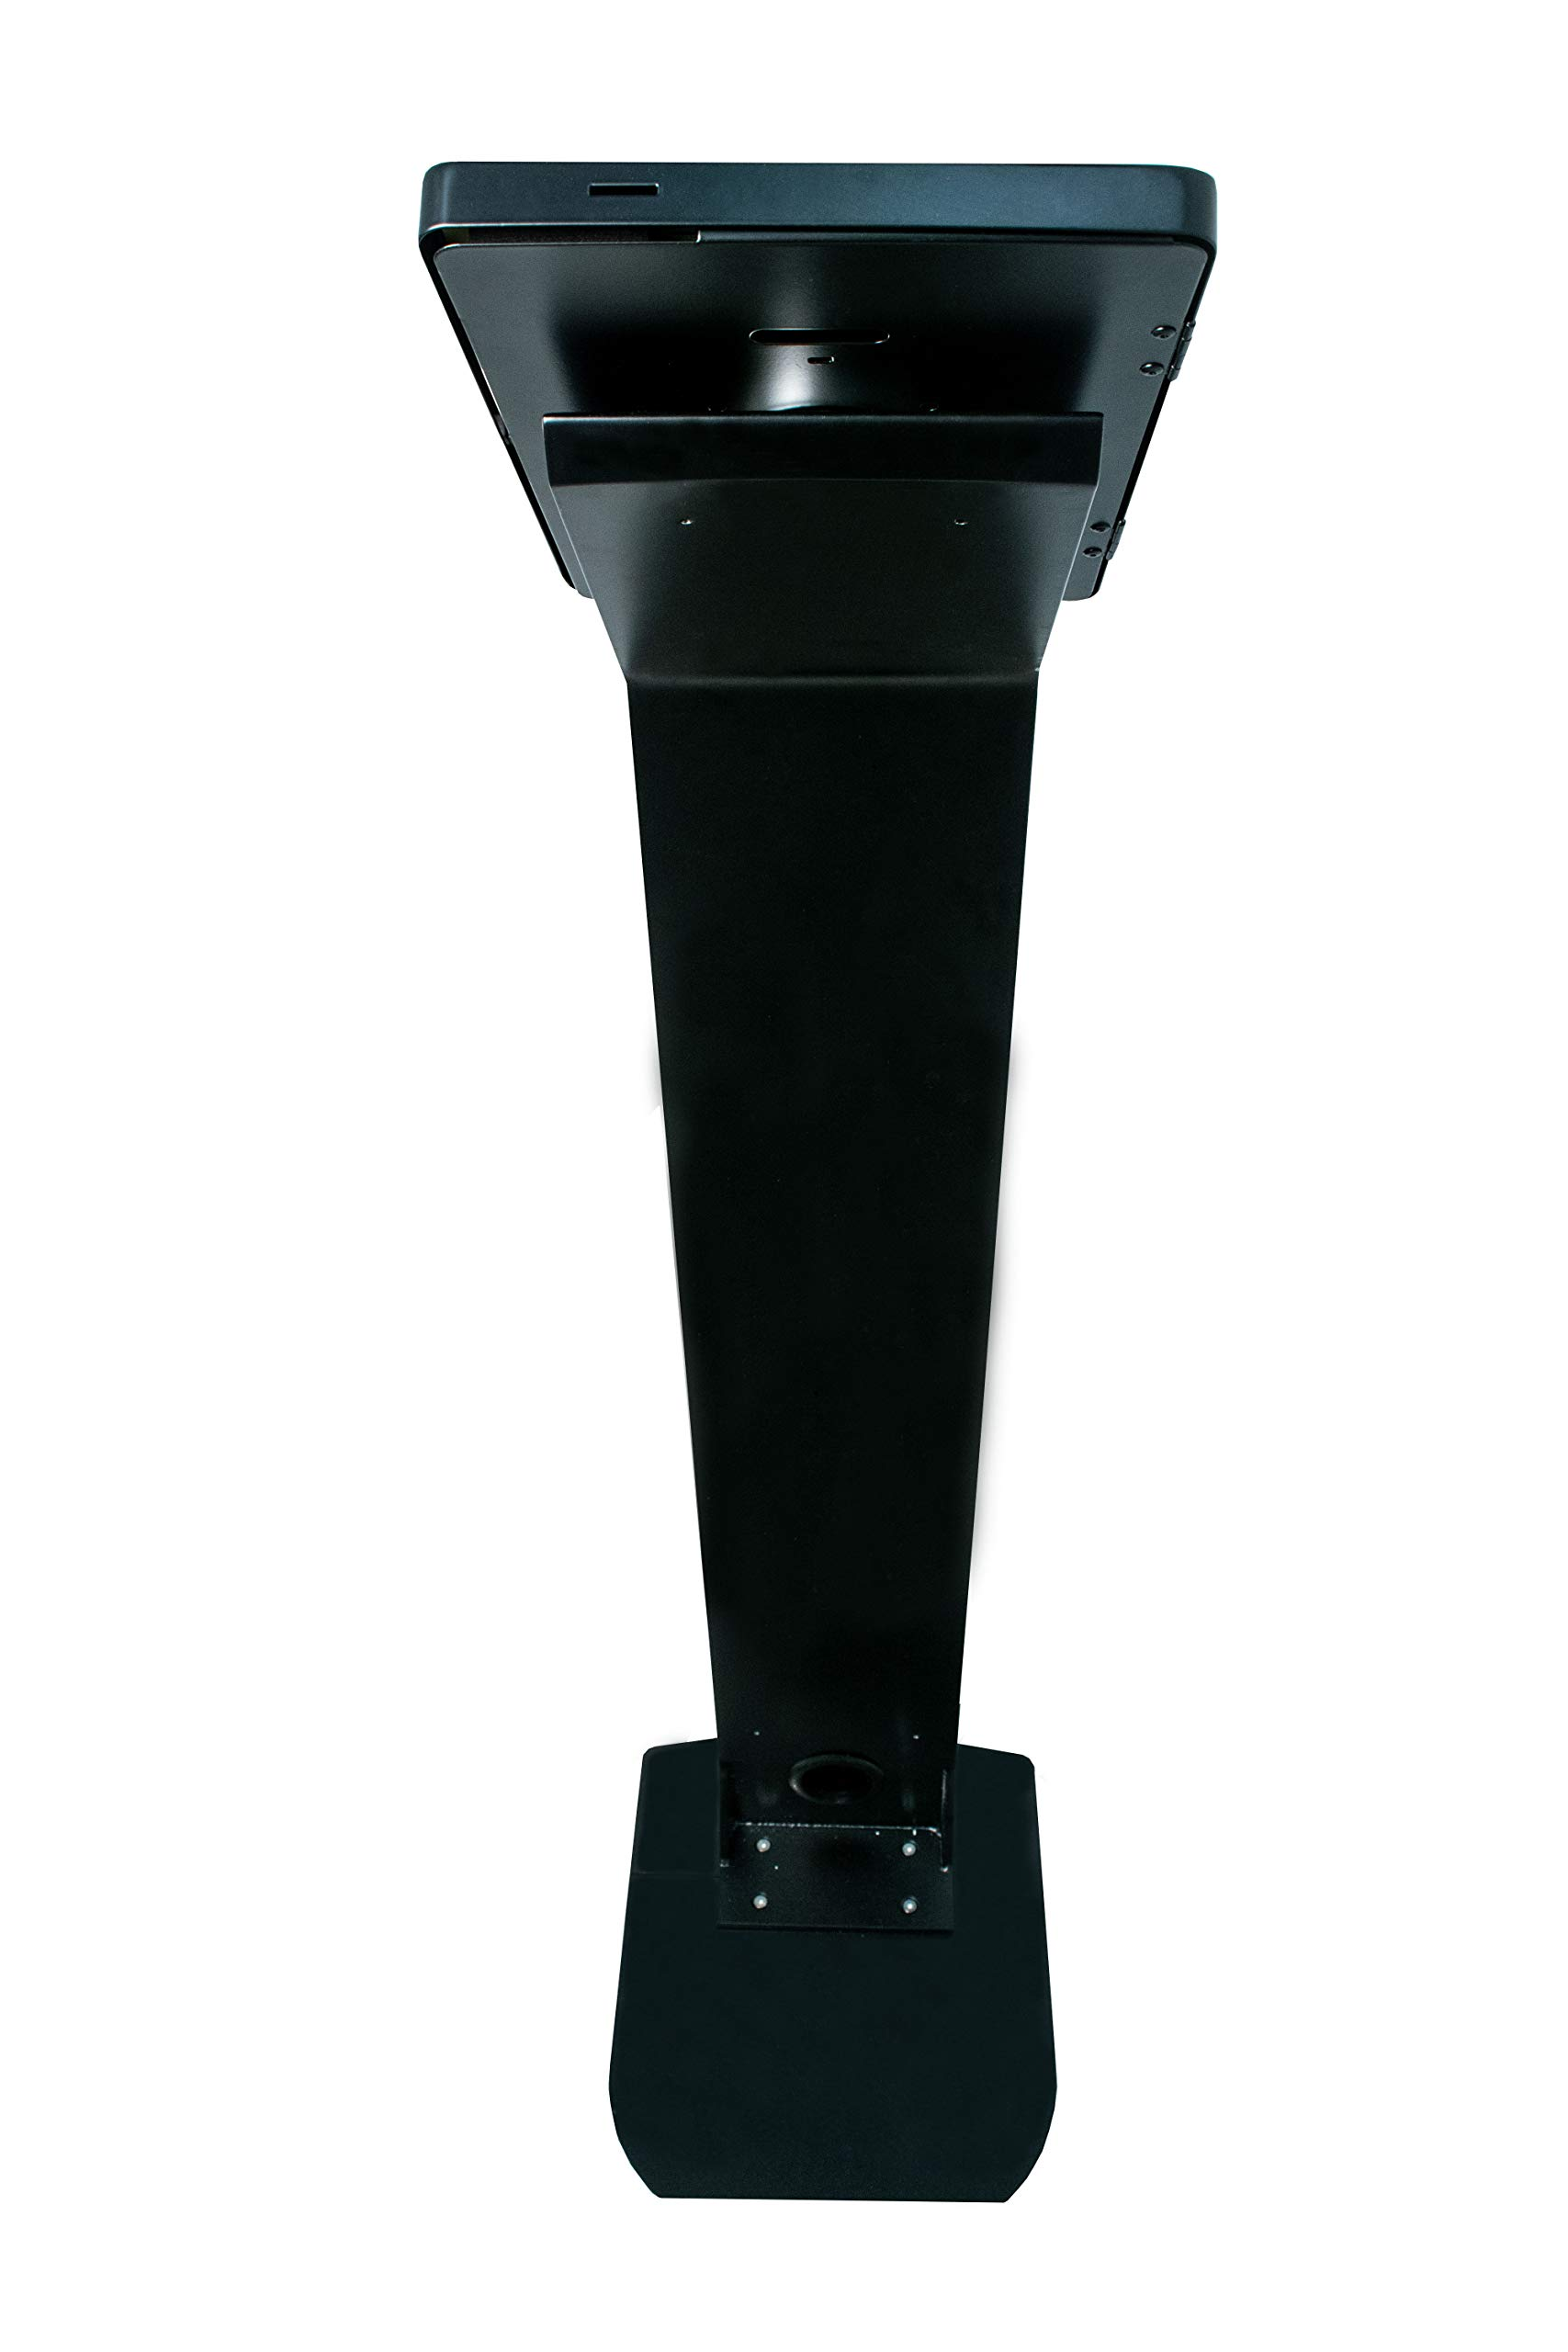 CTA Digital PAD-PARAF Premium Locking Floor Stand Kiosk for 11-inch iPad Pro/Air/Gen. 5-6 / Pro 10.5 / Galaxy Tab A 9.7'' / S2 9.7'' / 3 10.1'' / 4 10.1'' by CTA Digital (Image #7)